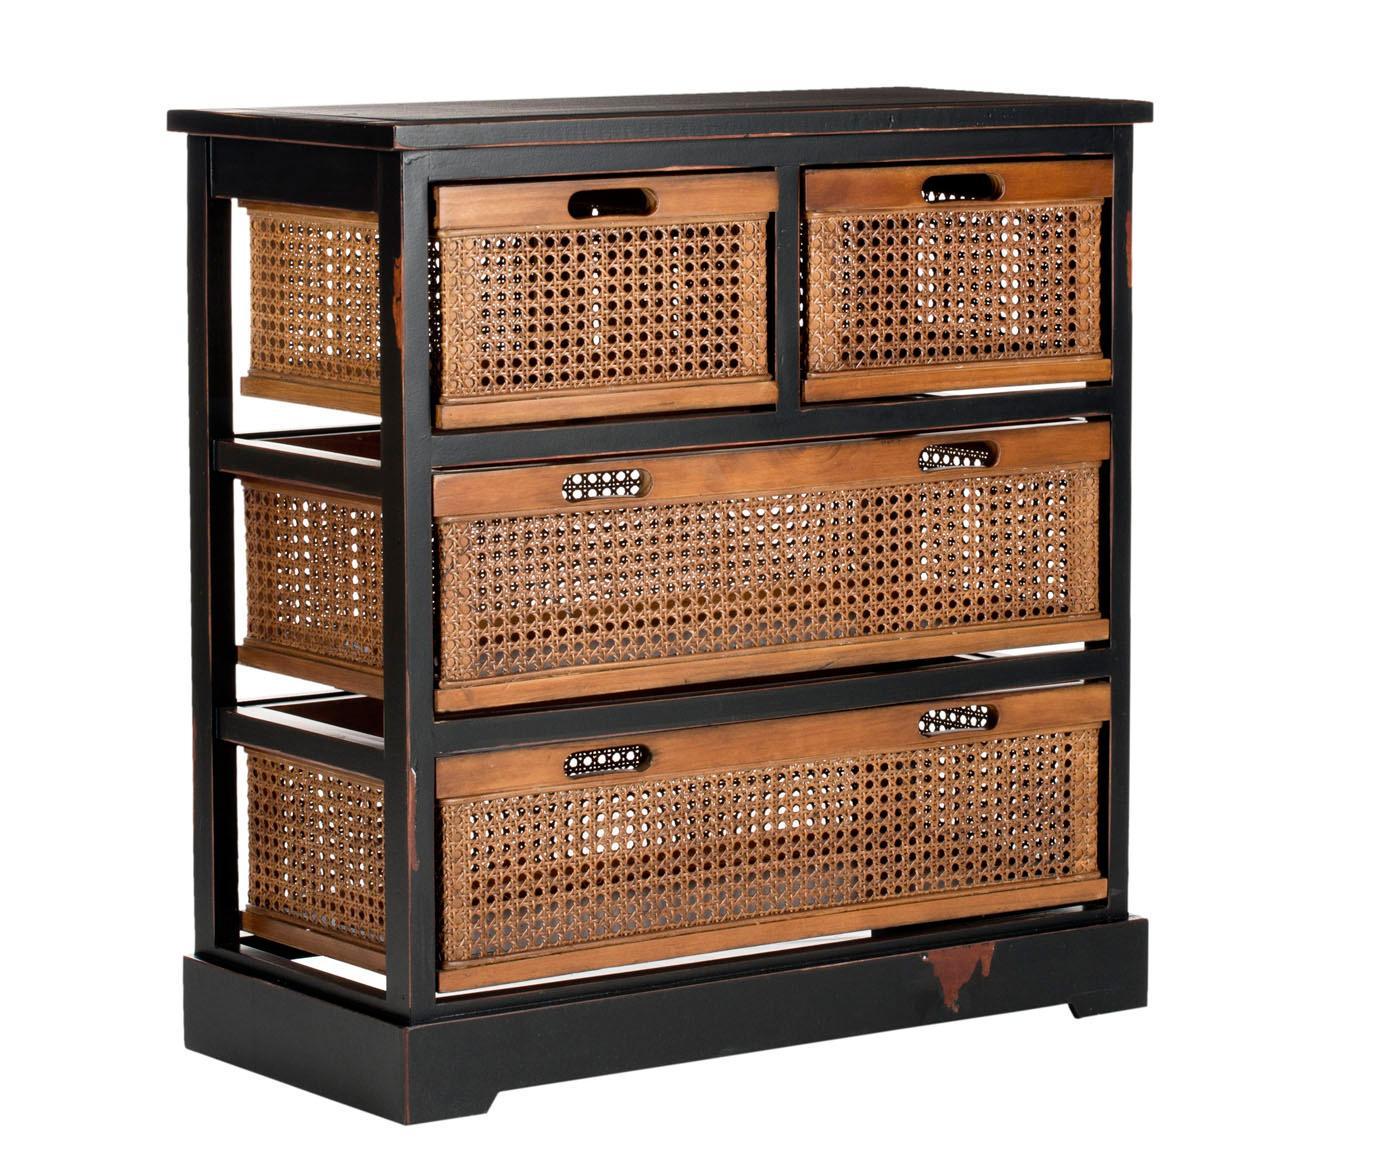 Rattan-Kommode Bantu mit Schubladen, Korpus: Kiefernholz, lackiert, Naturholz, schwarz, 74 x 77 cm